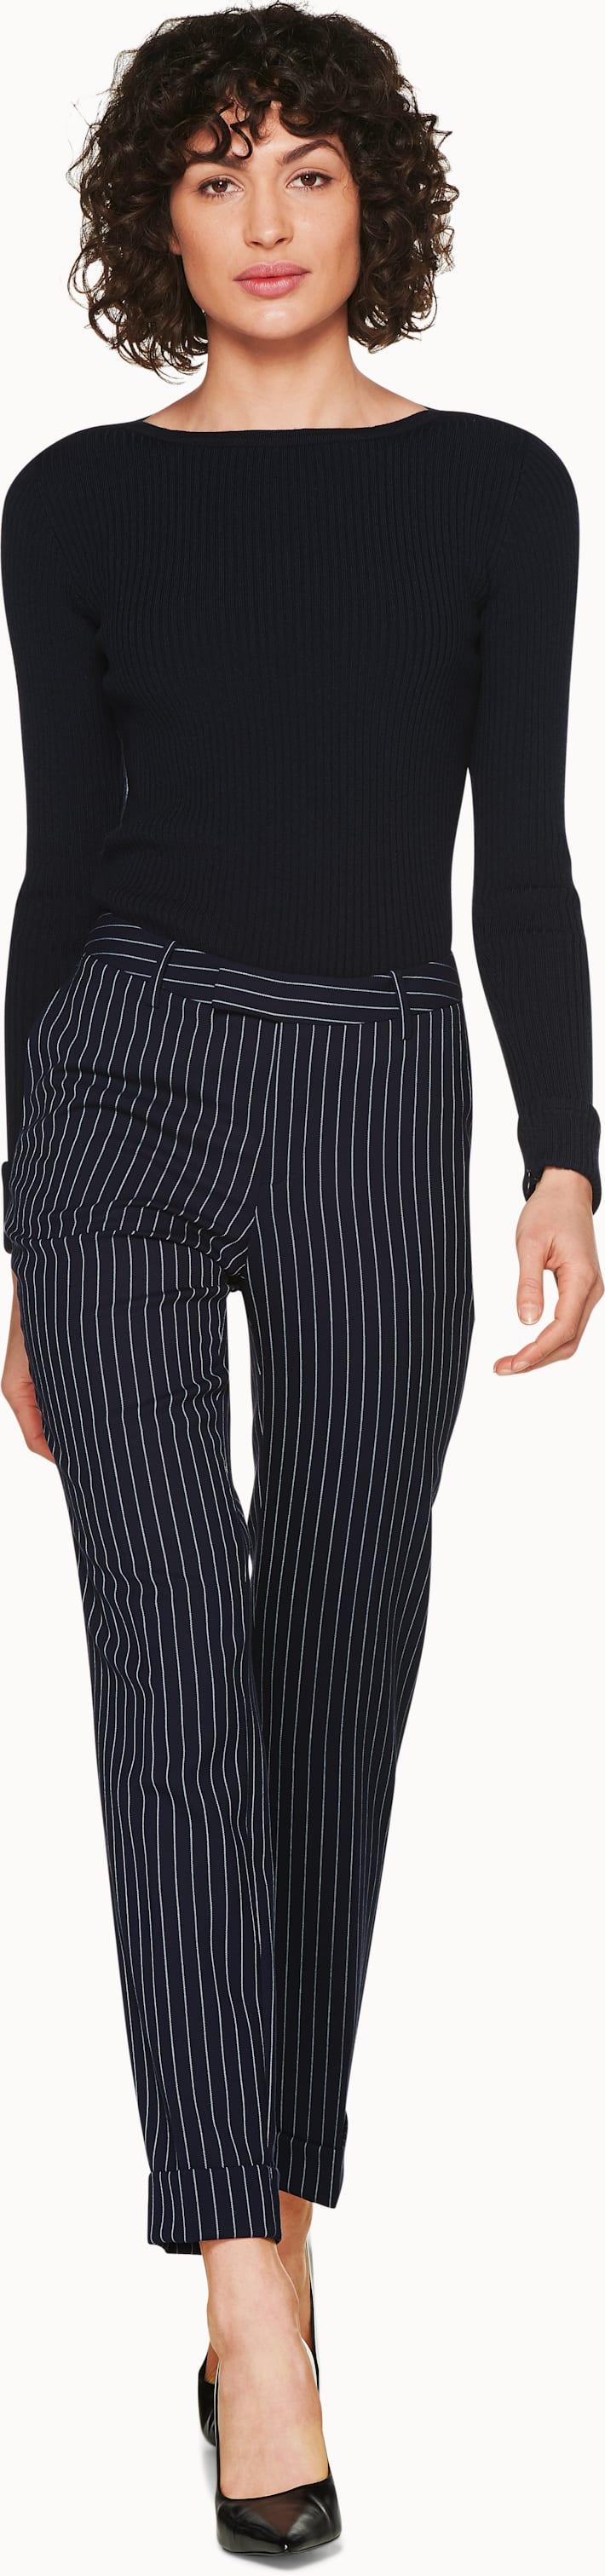 Cael Navy Long-Sleeve Knit